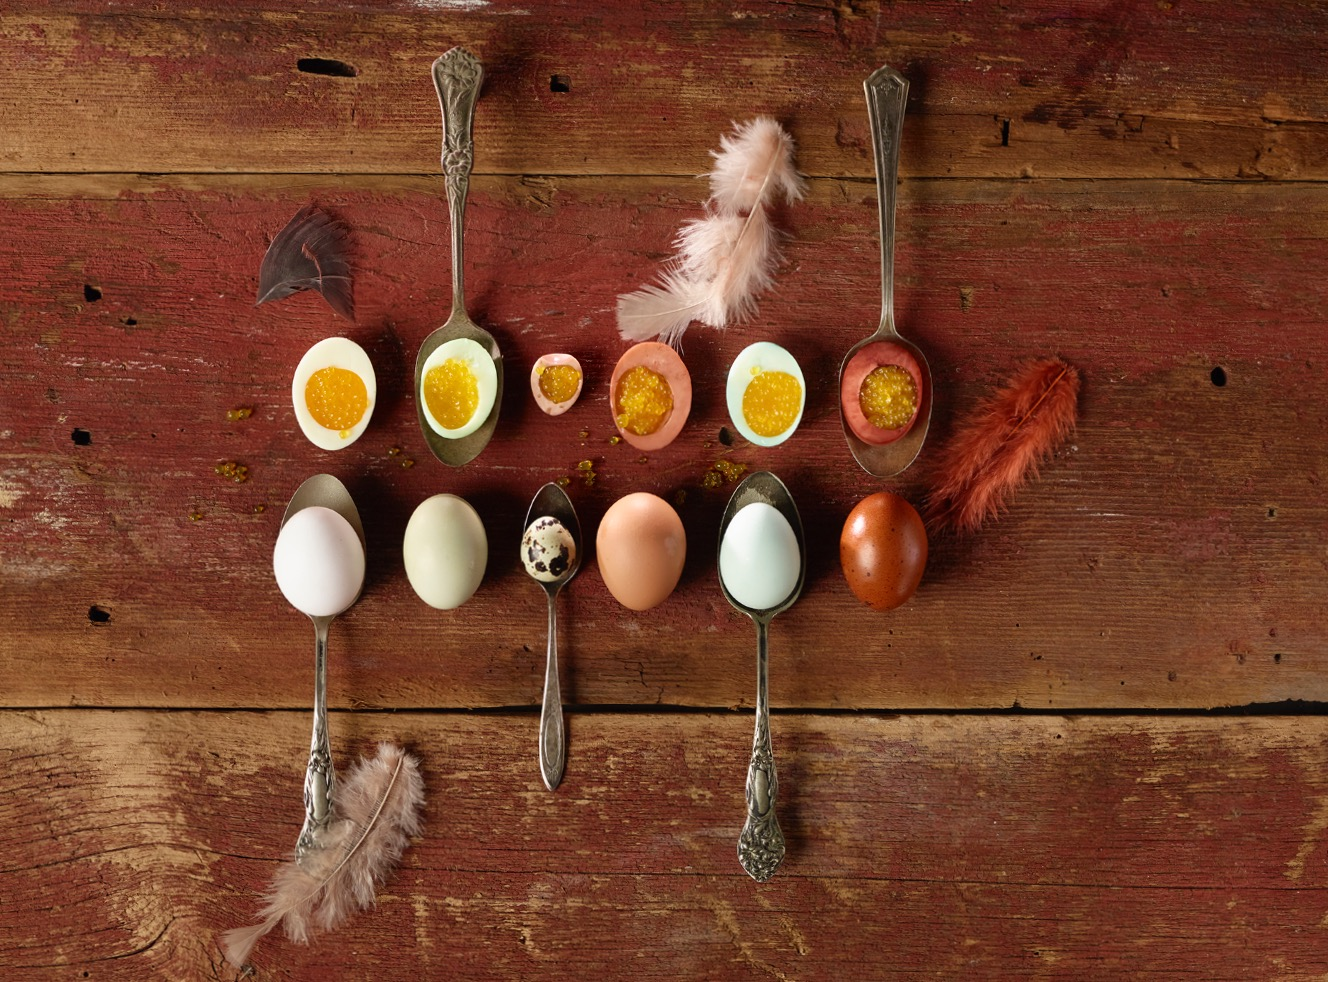 Eggs overhead